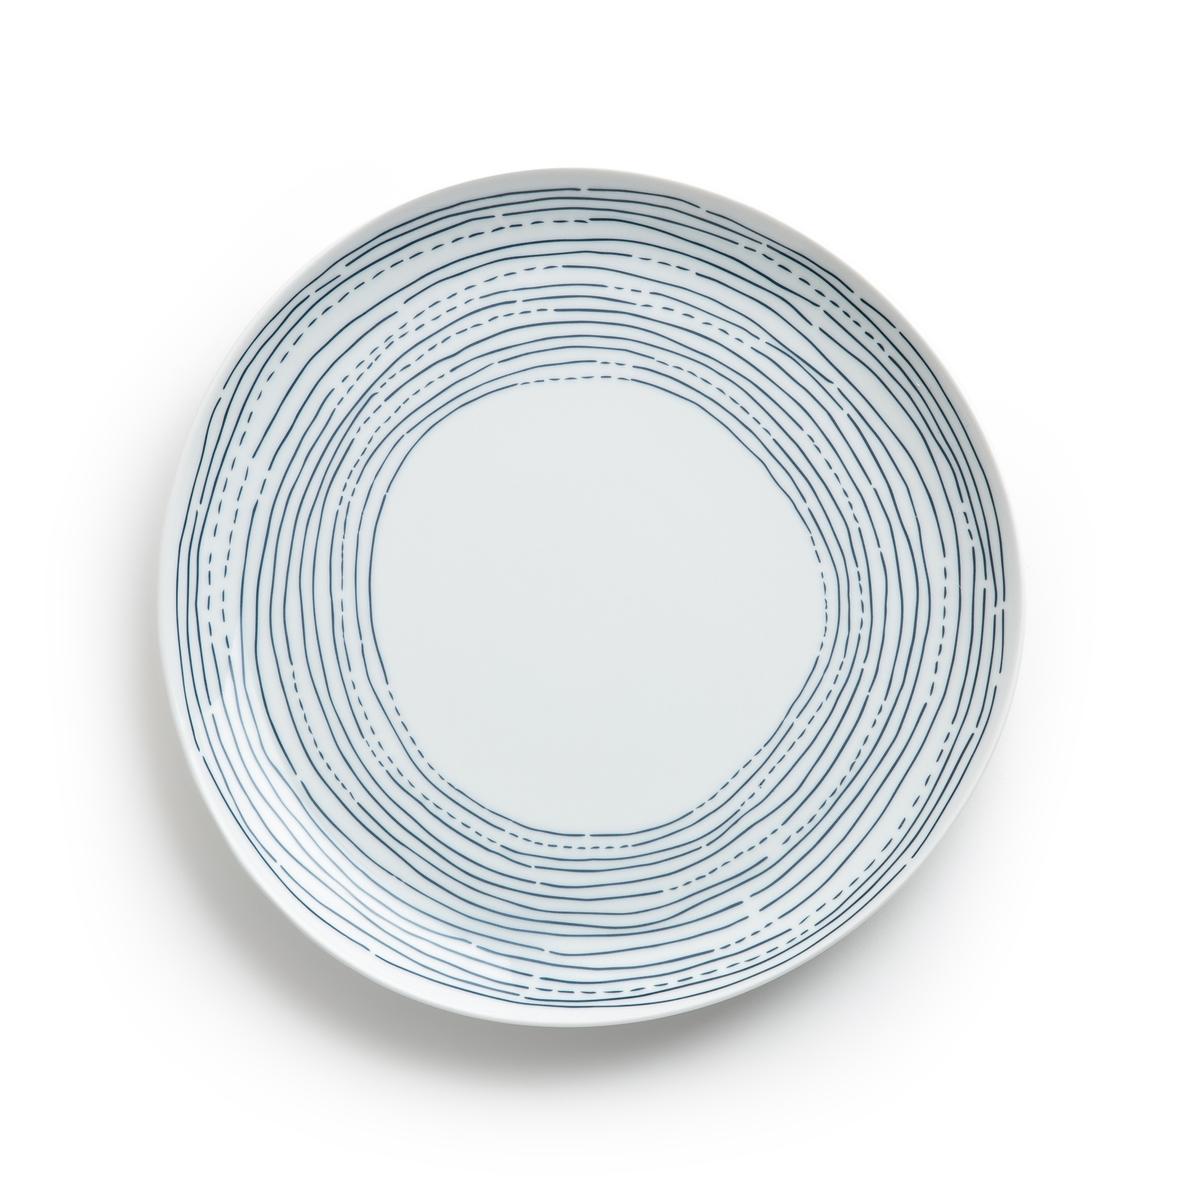 Комплект из 4 мелких тарелок Agaxan